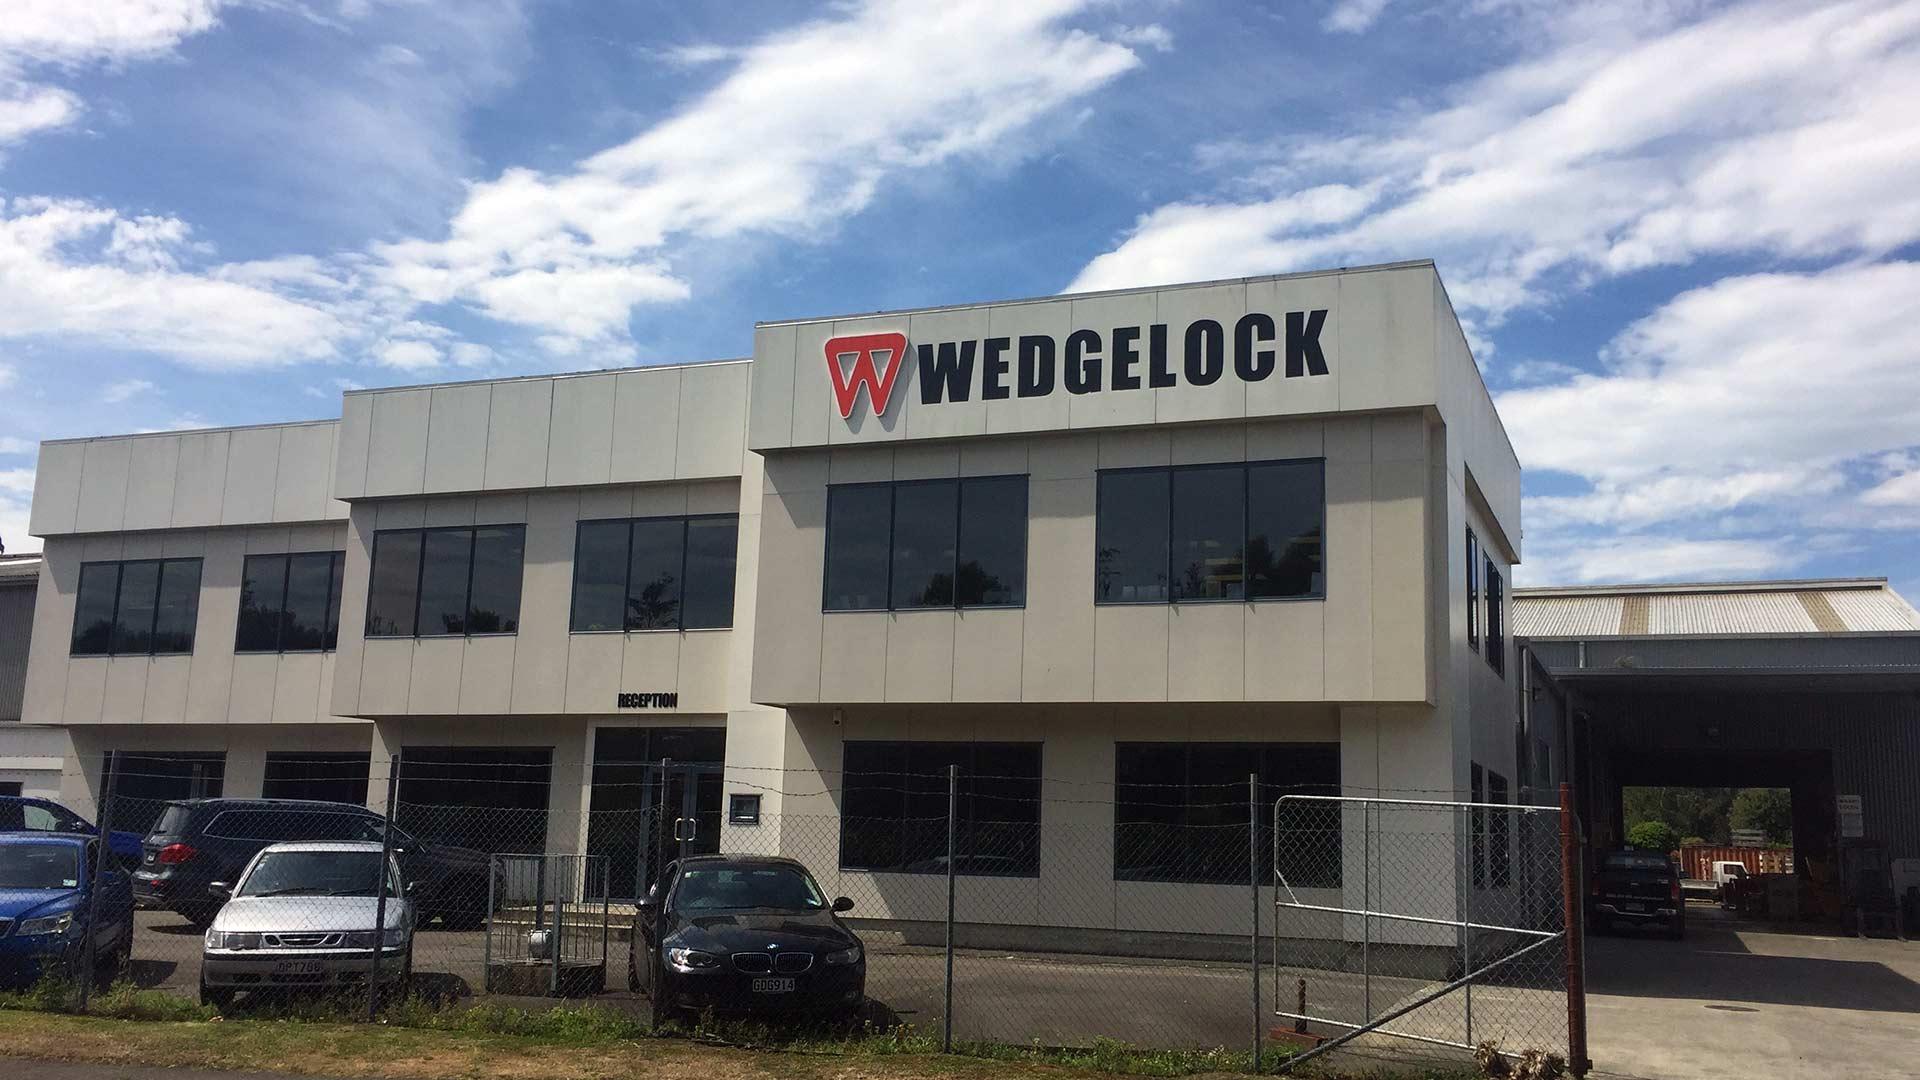 Wedgelock Head Office